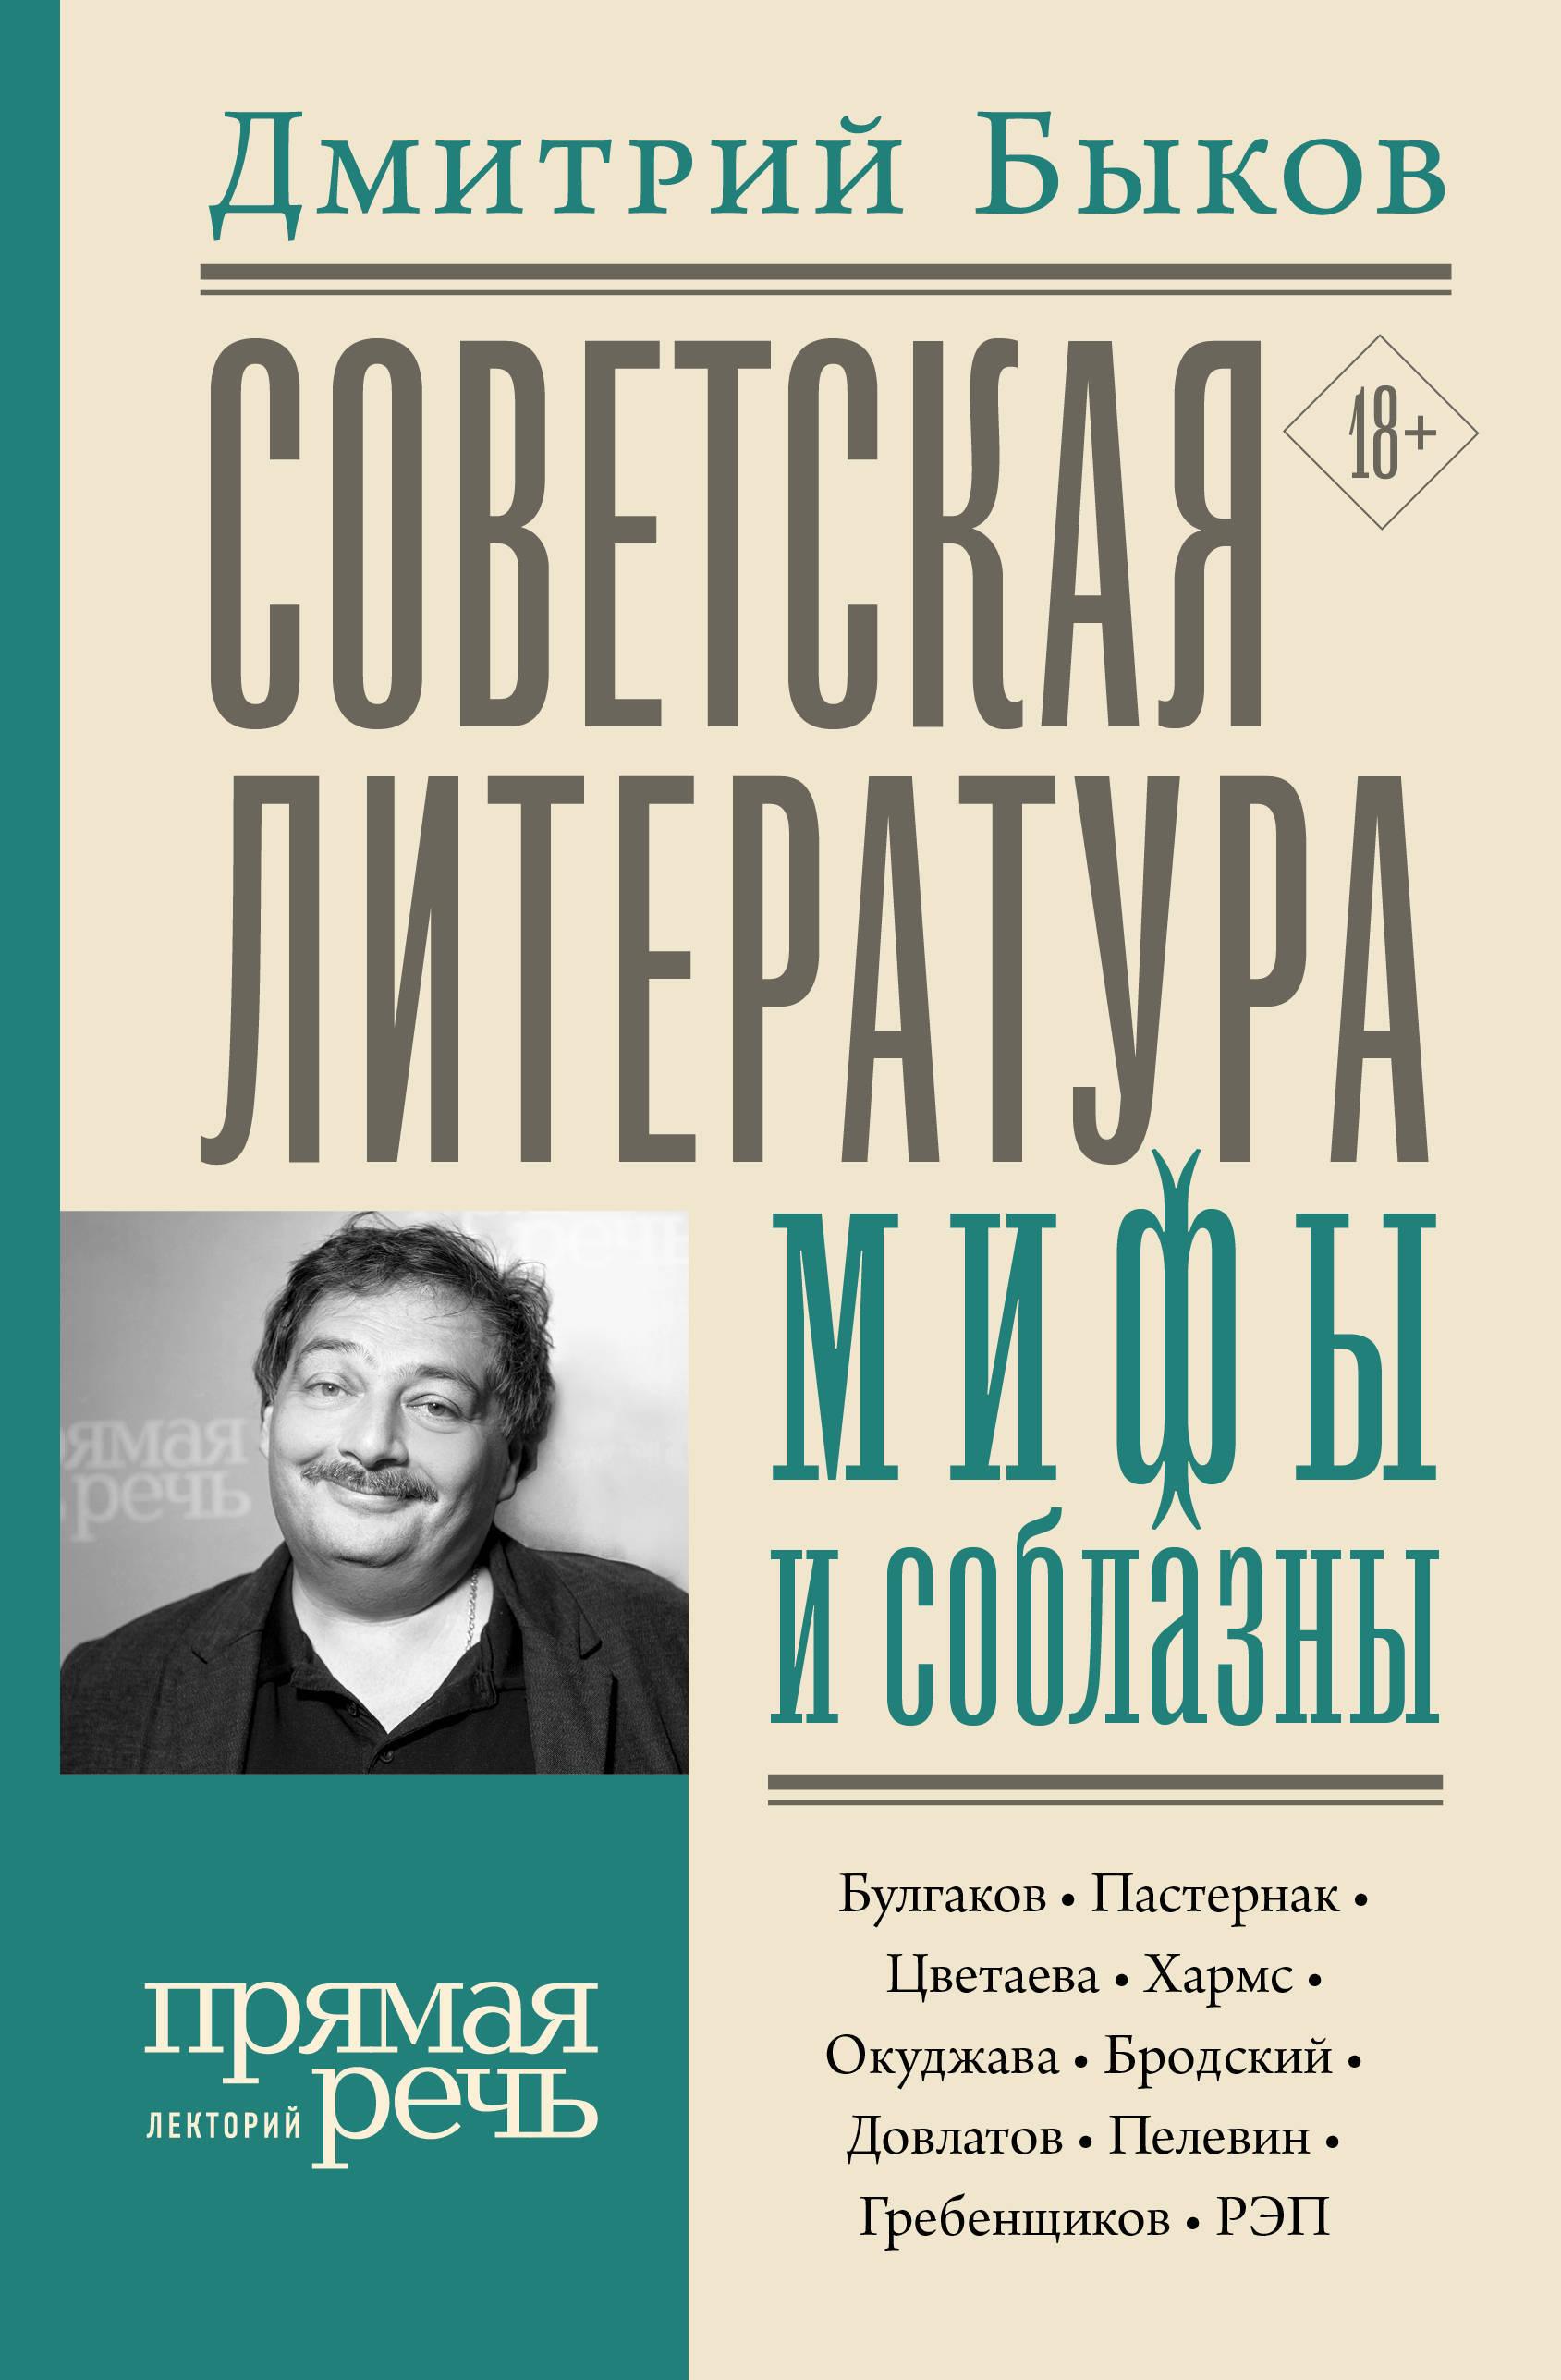 Sovetskaja literatura: mify i soblazny